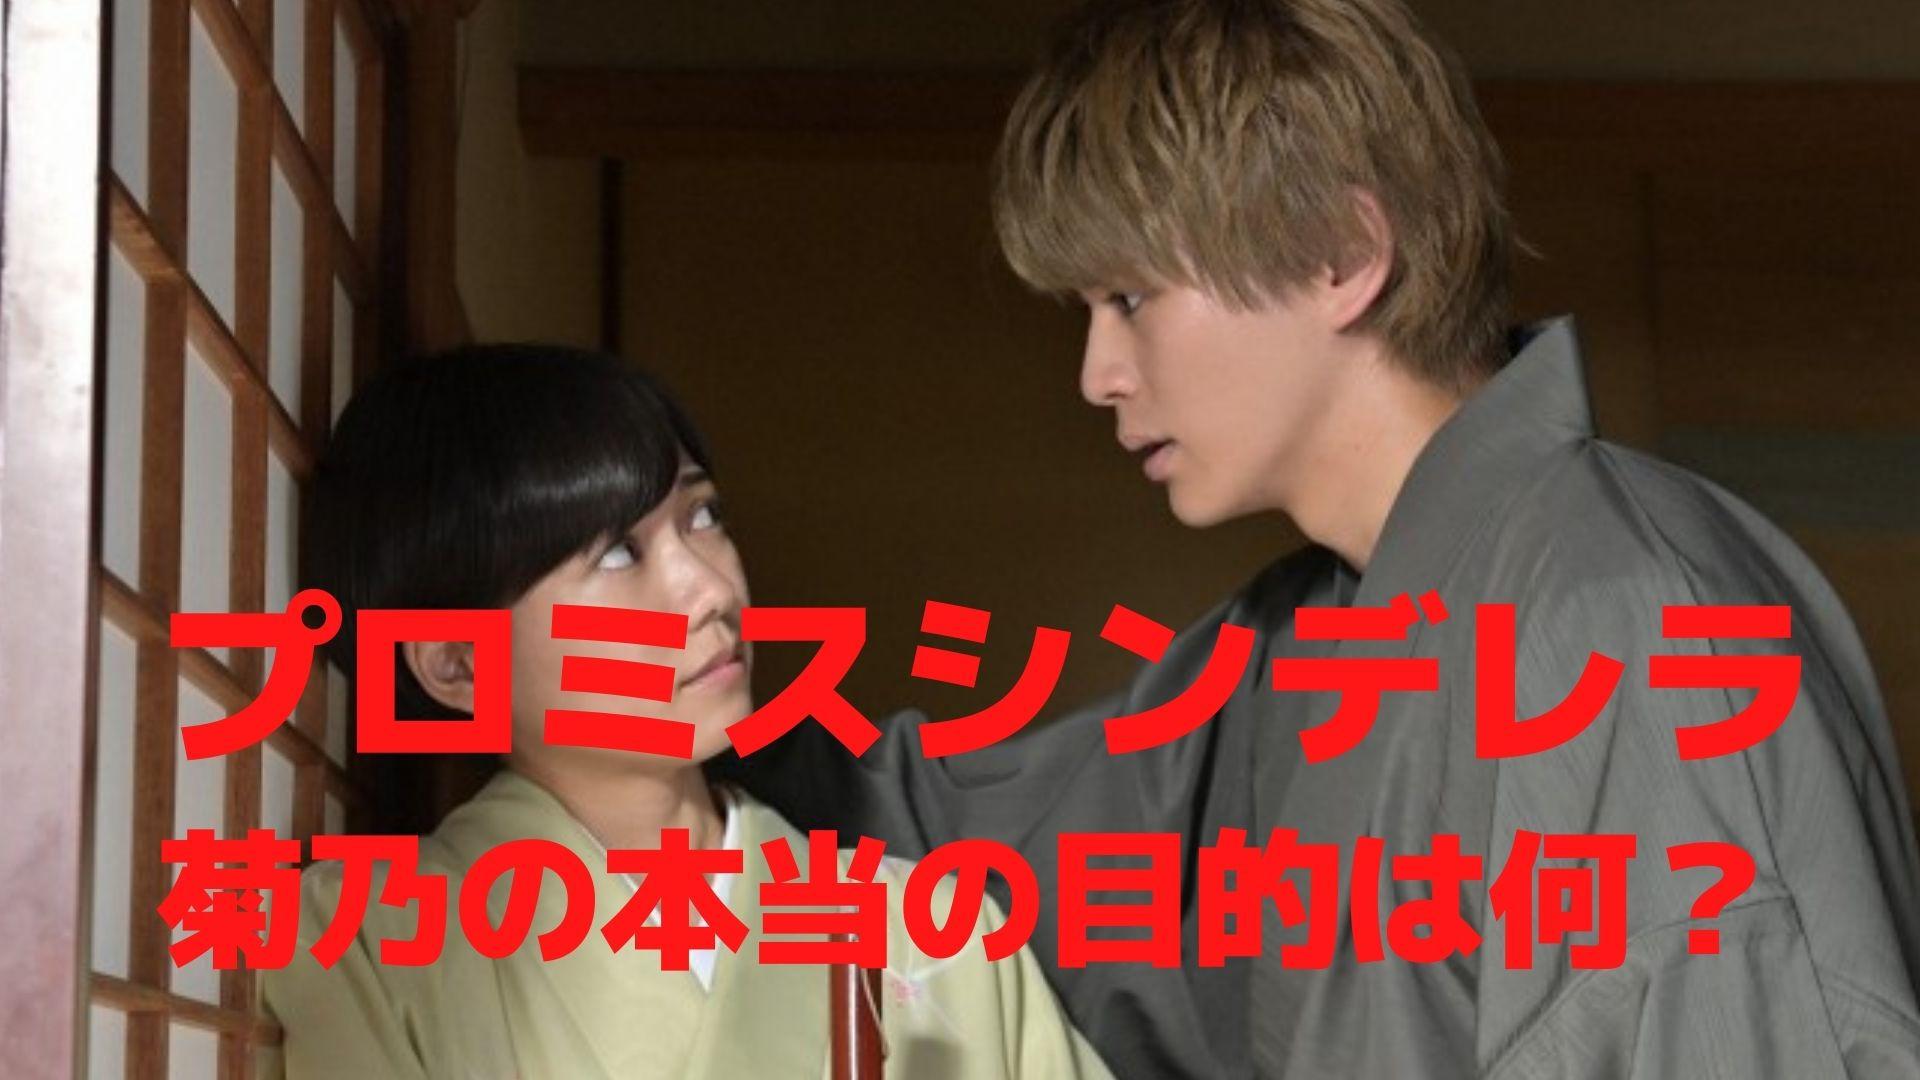 promise-cinderella-ichinari-ayame-height-difference